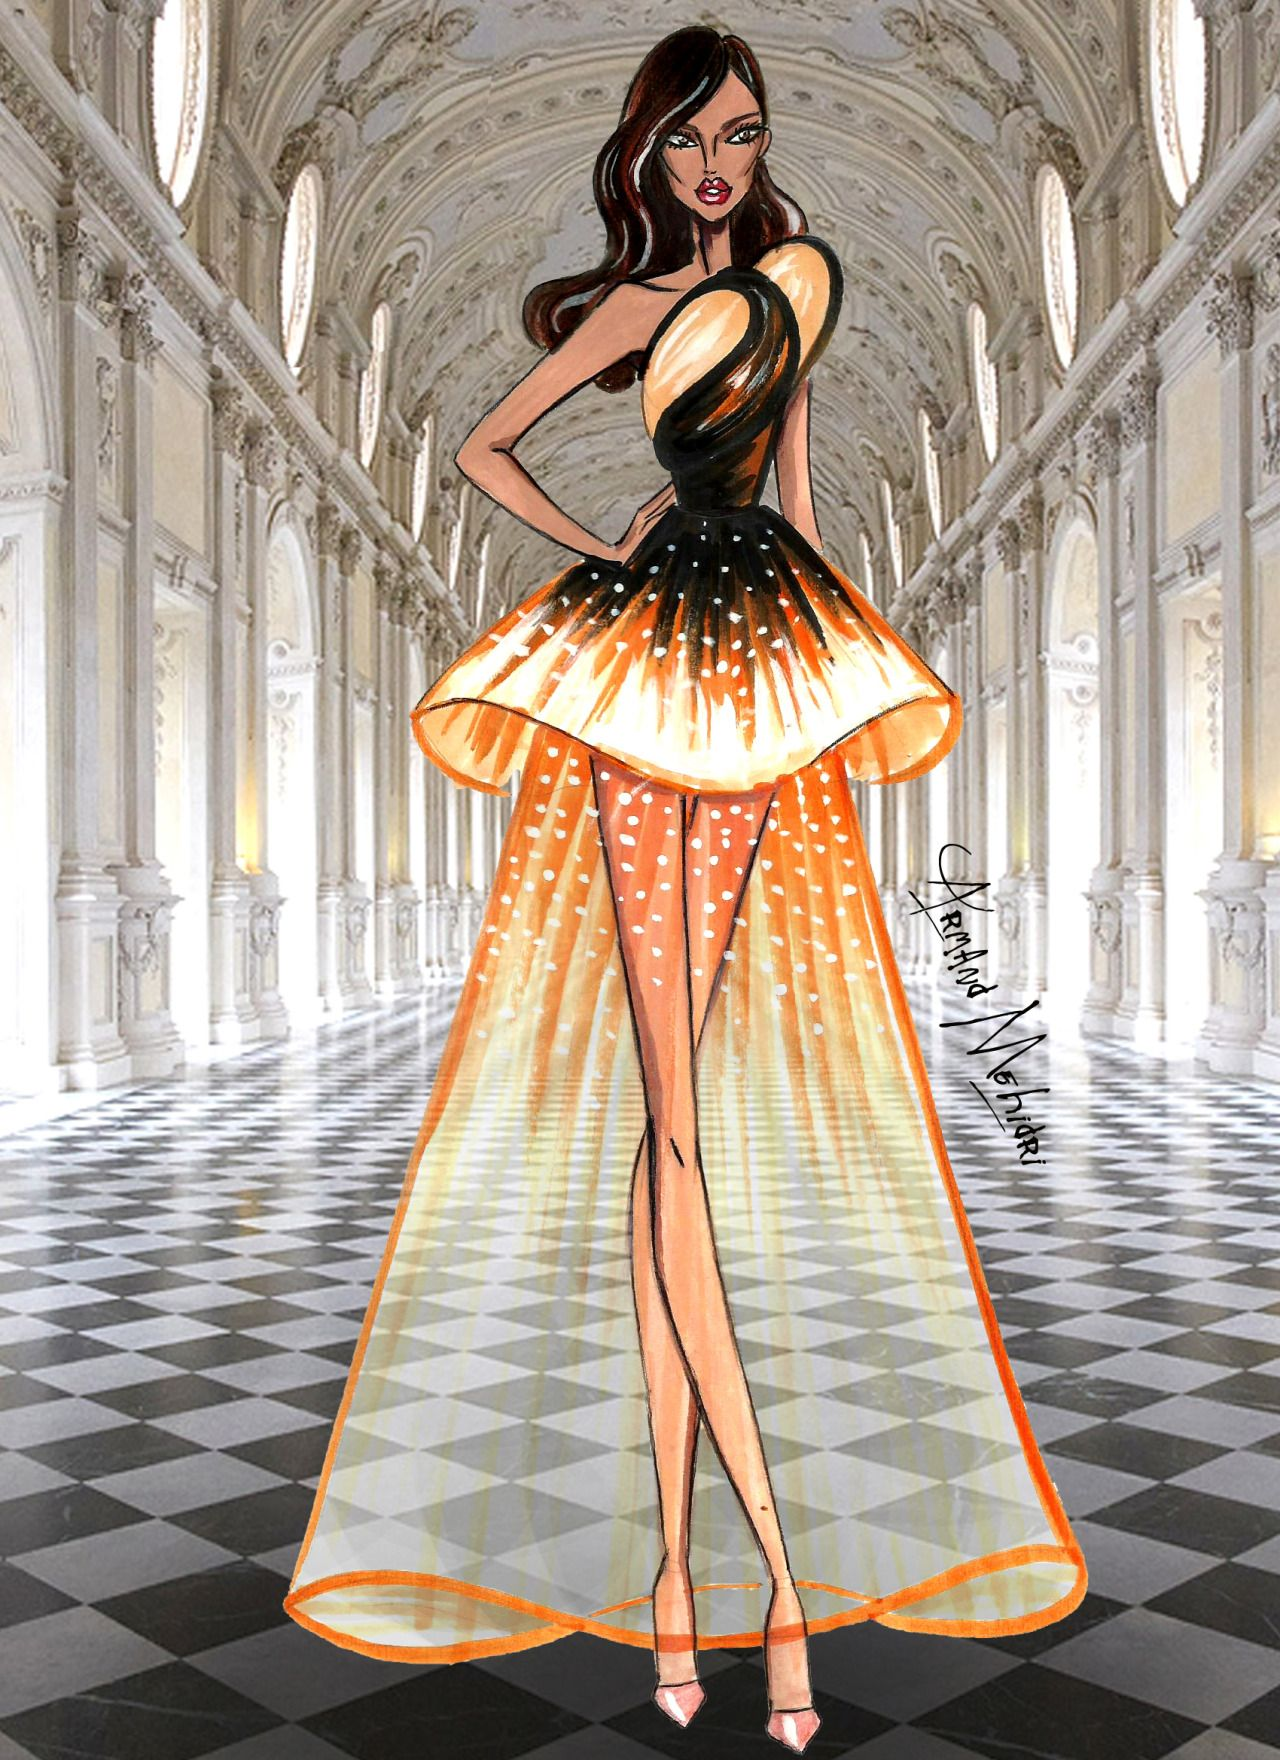 FASHION ILLUSTRATIONS by ARMAND MEHIDRI. — Haute Couture by Armand Mehidri…